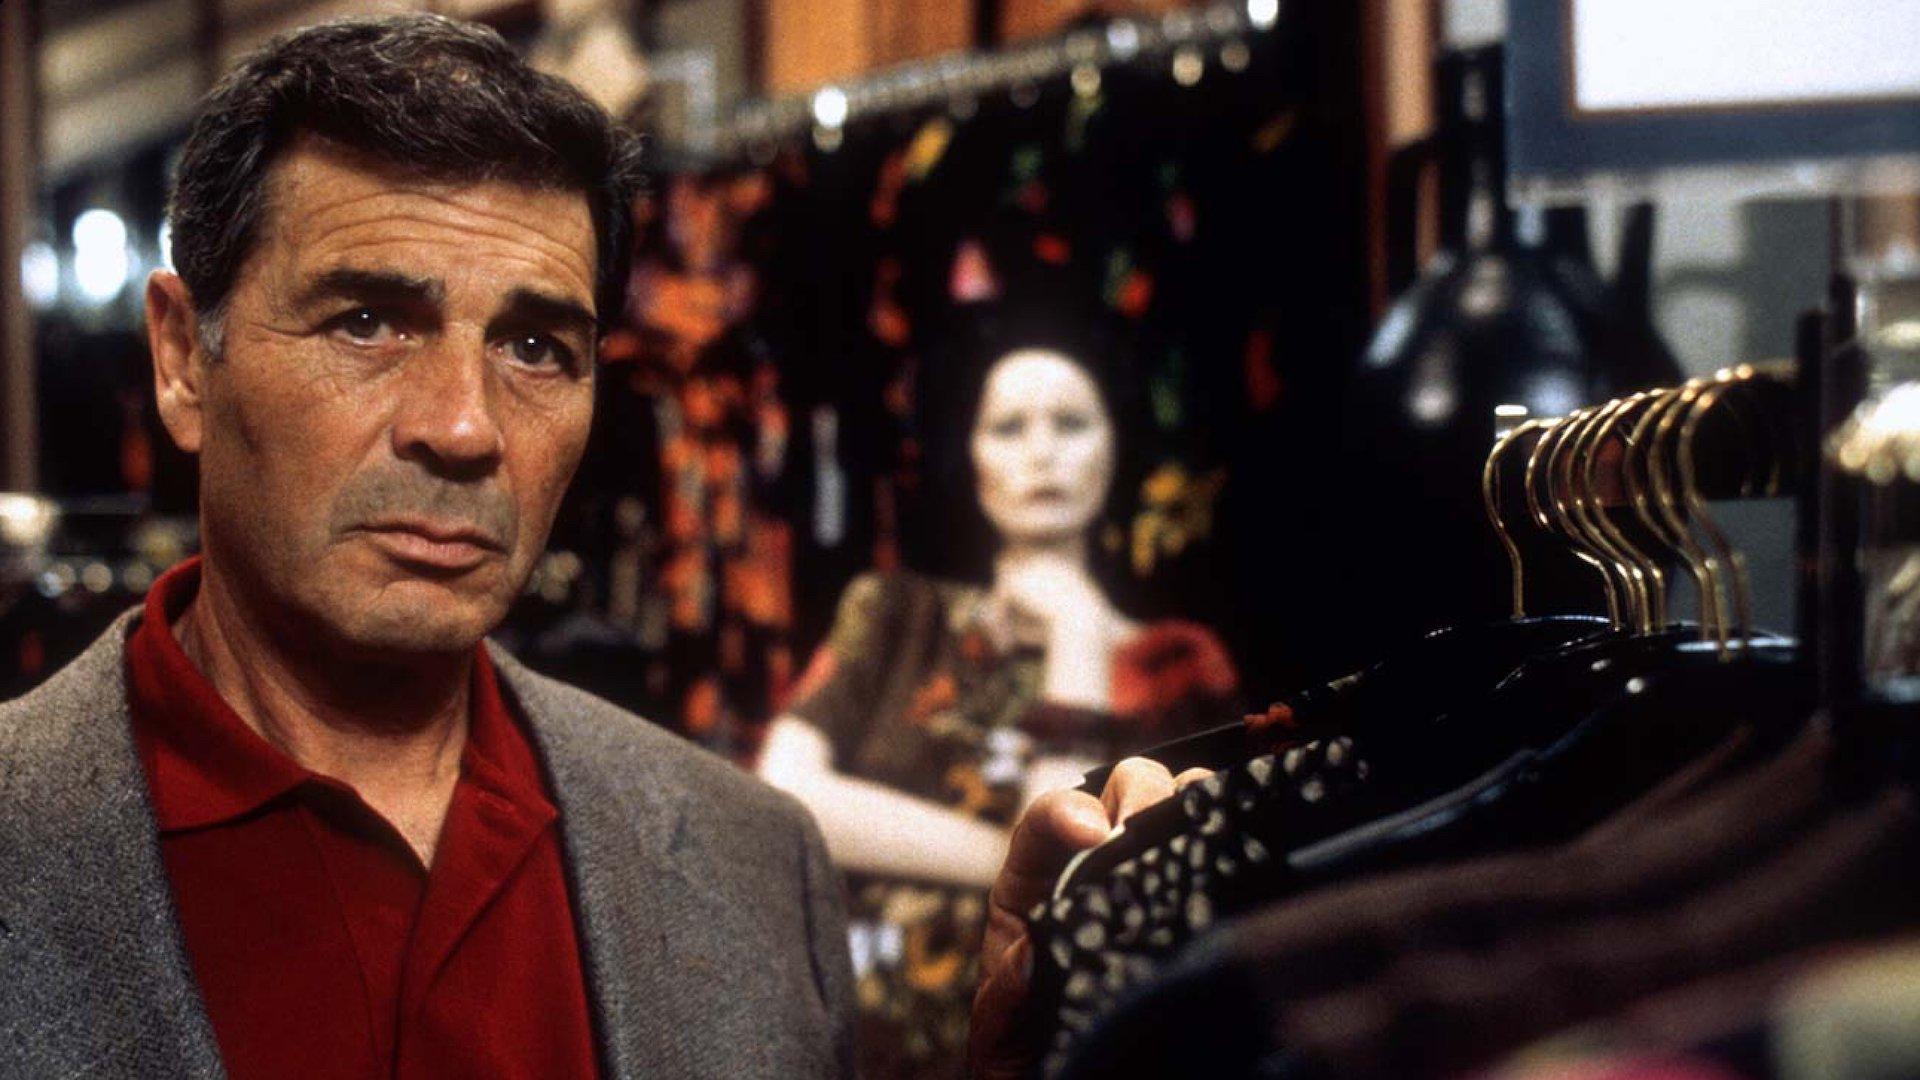 Robert Forster: muore a 78 anni l'interprete di Jackie Brown e Twin Peaks